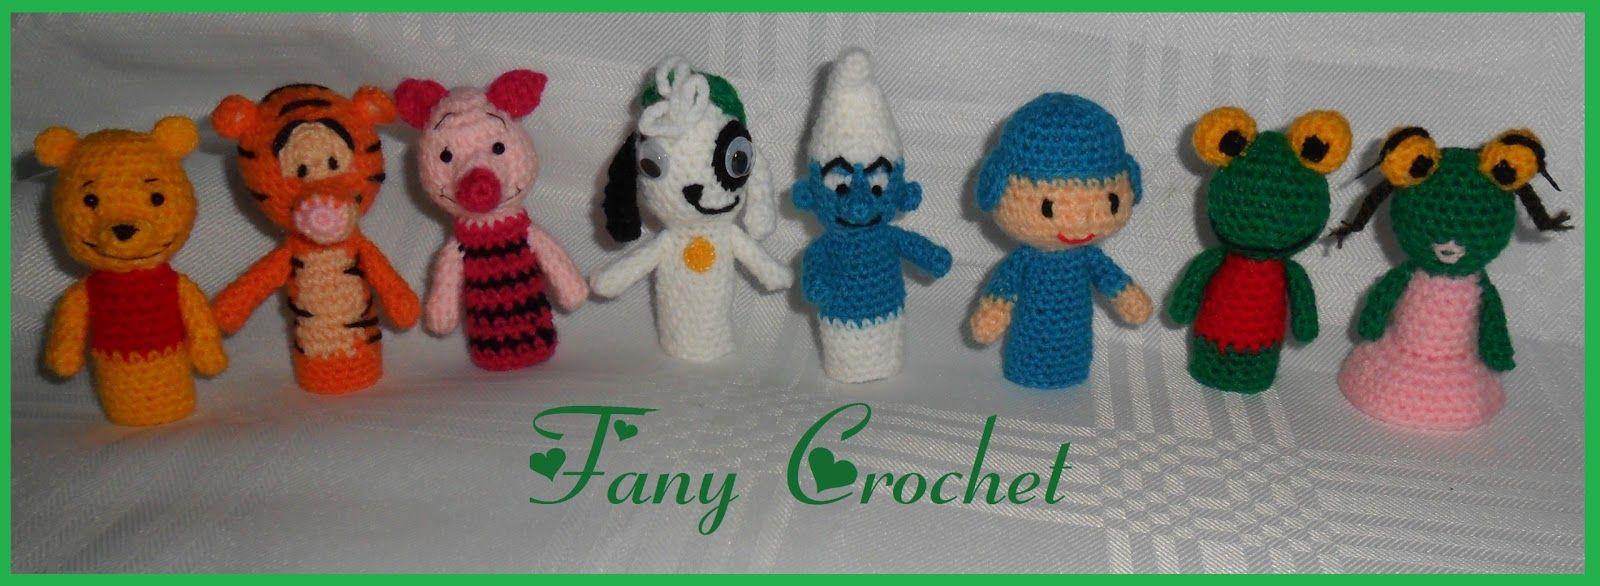 amigurumis, muñecos a crochet, fany crochet. | Toy knits | Pinterest ...